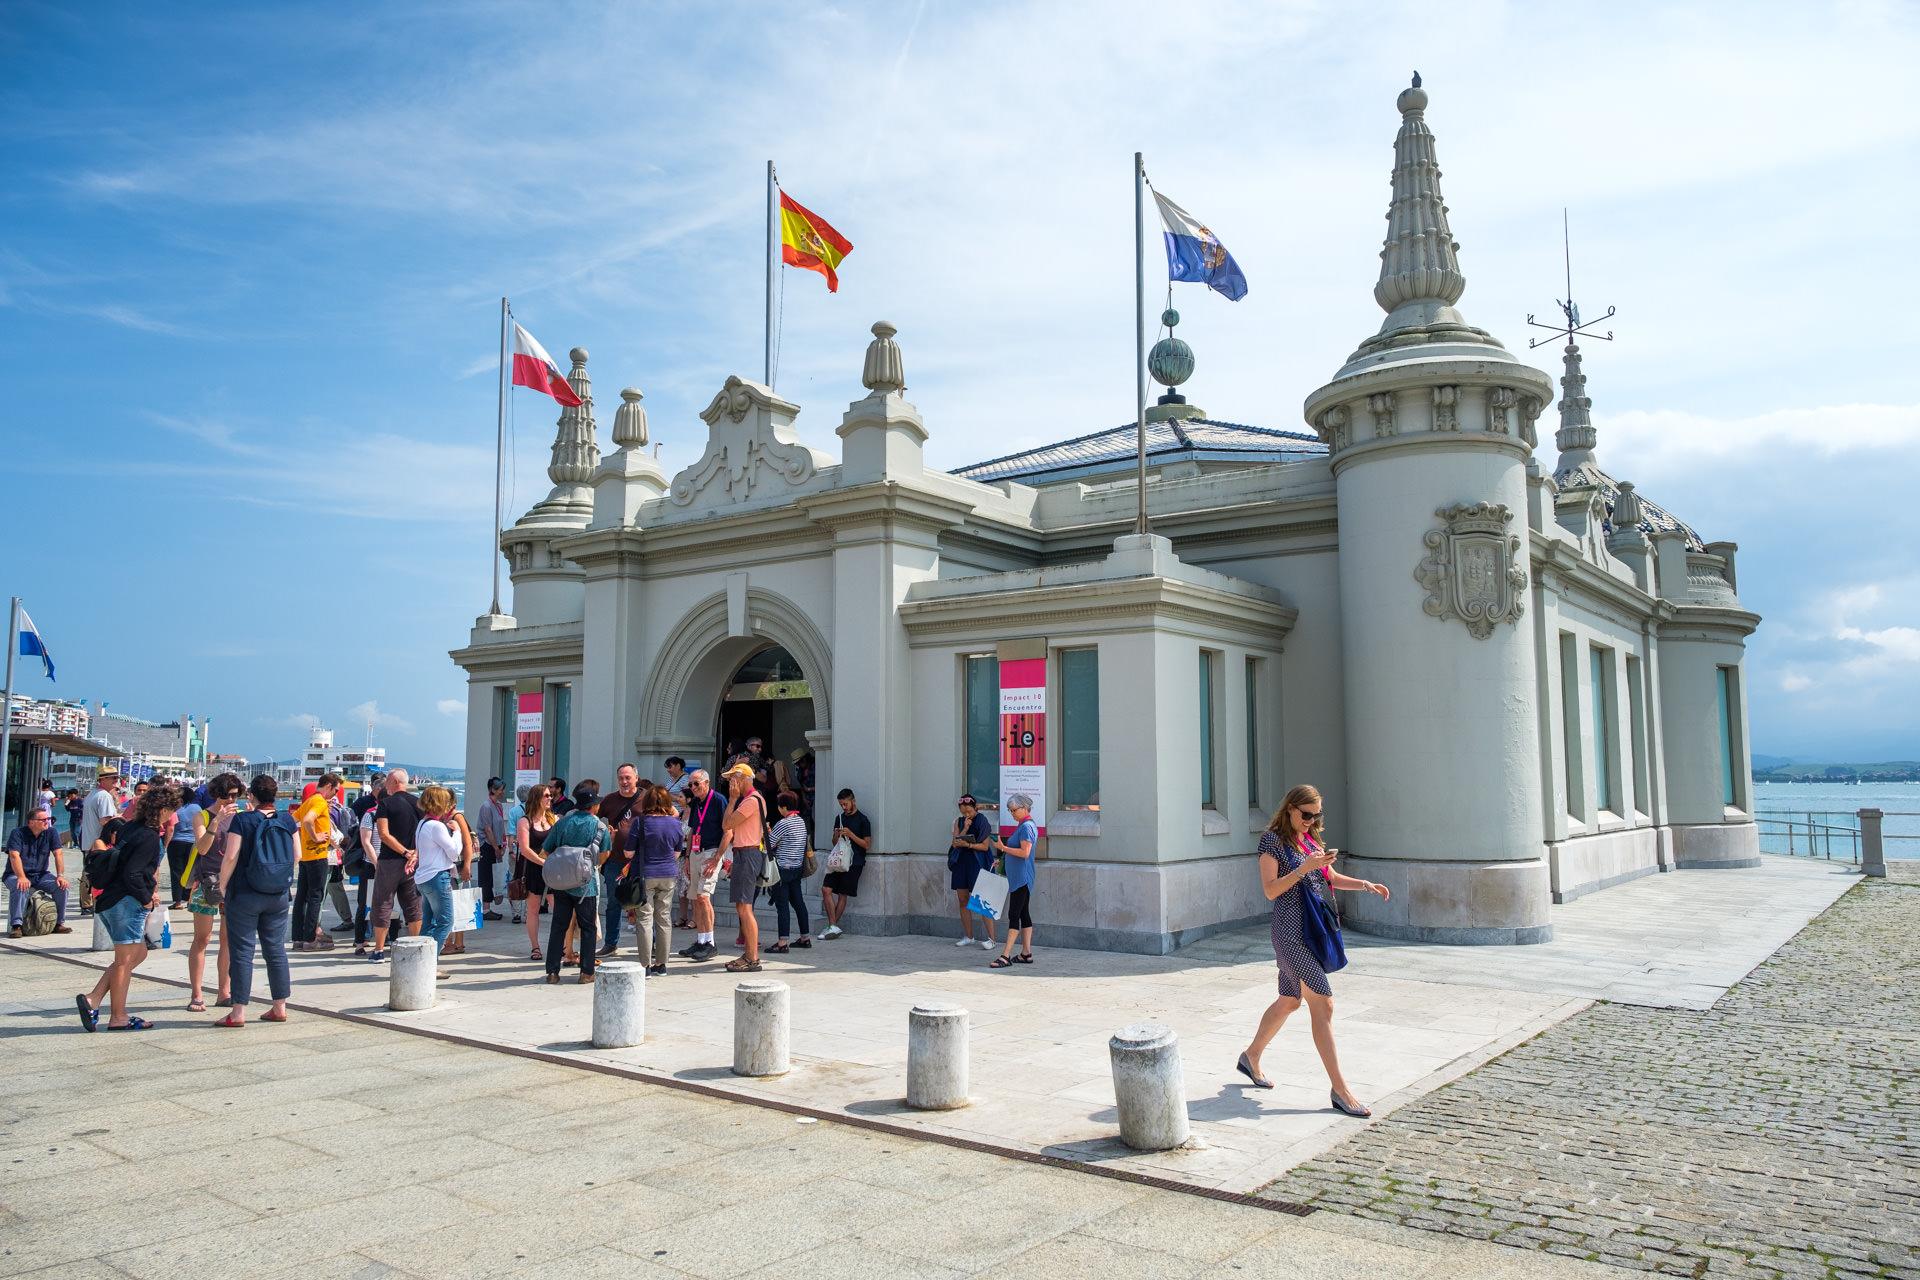 September - The 'Impact' print conference at Santander, Spain...